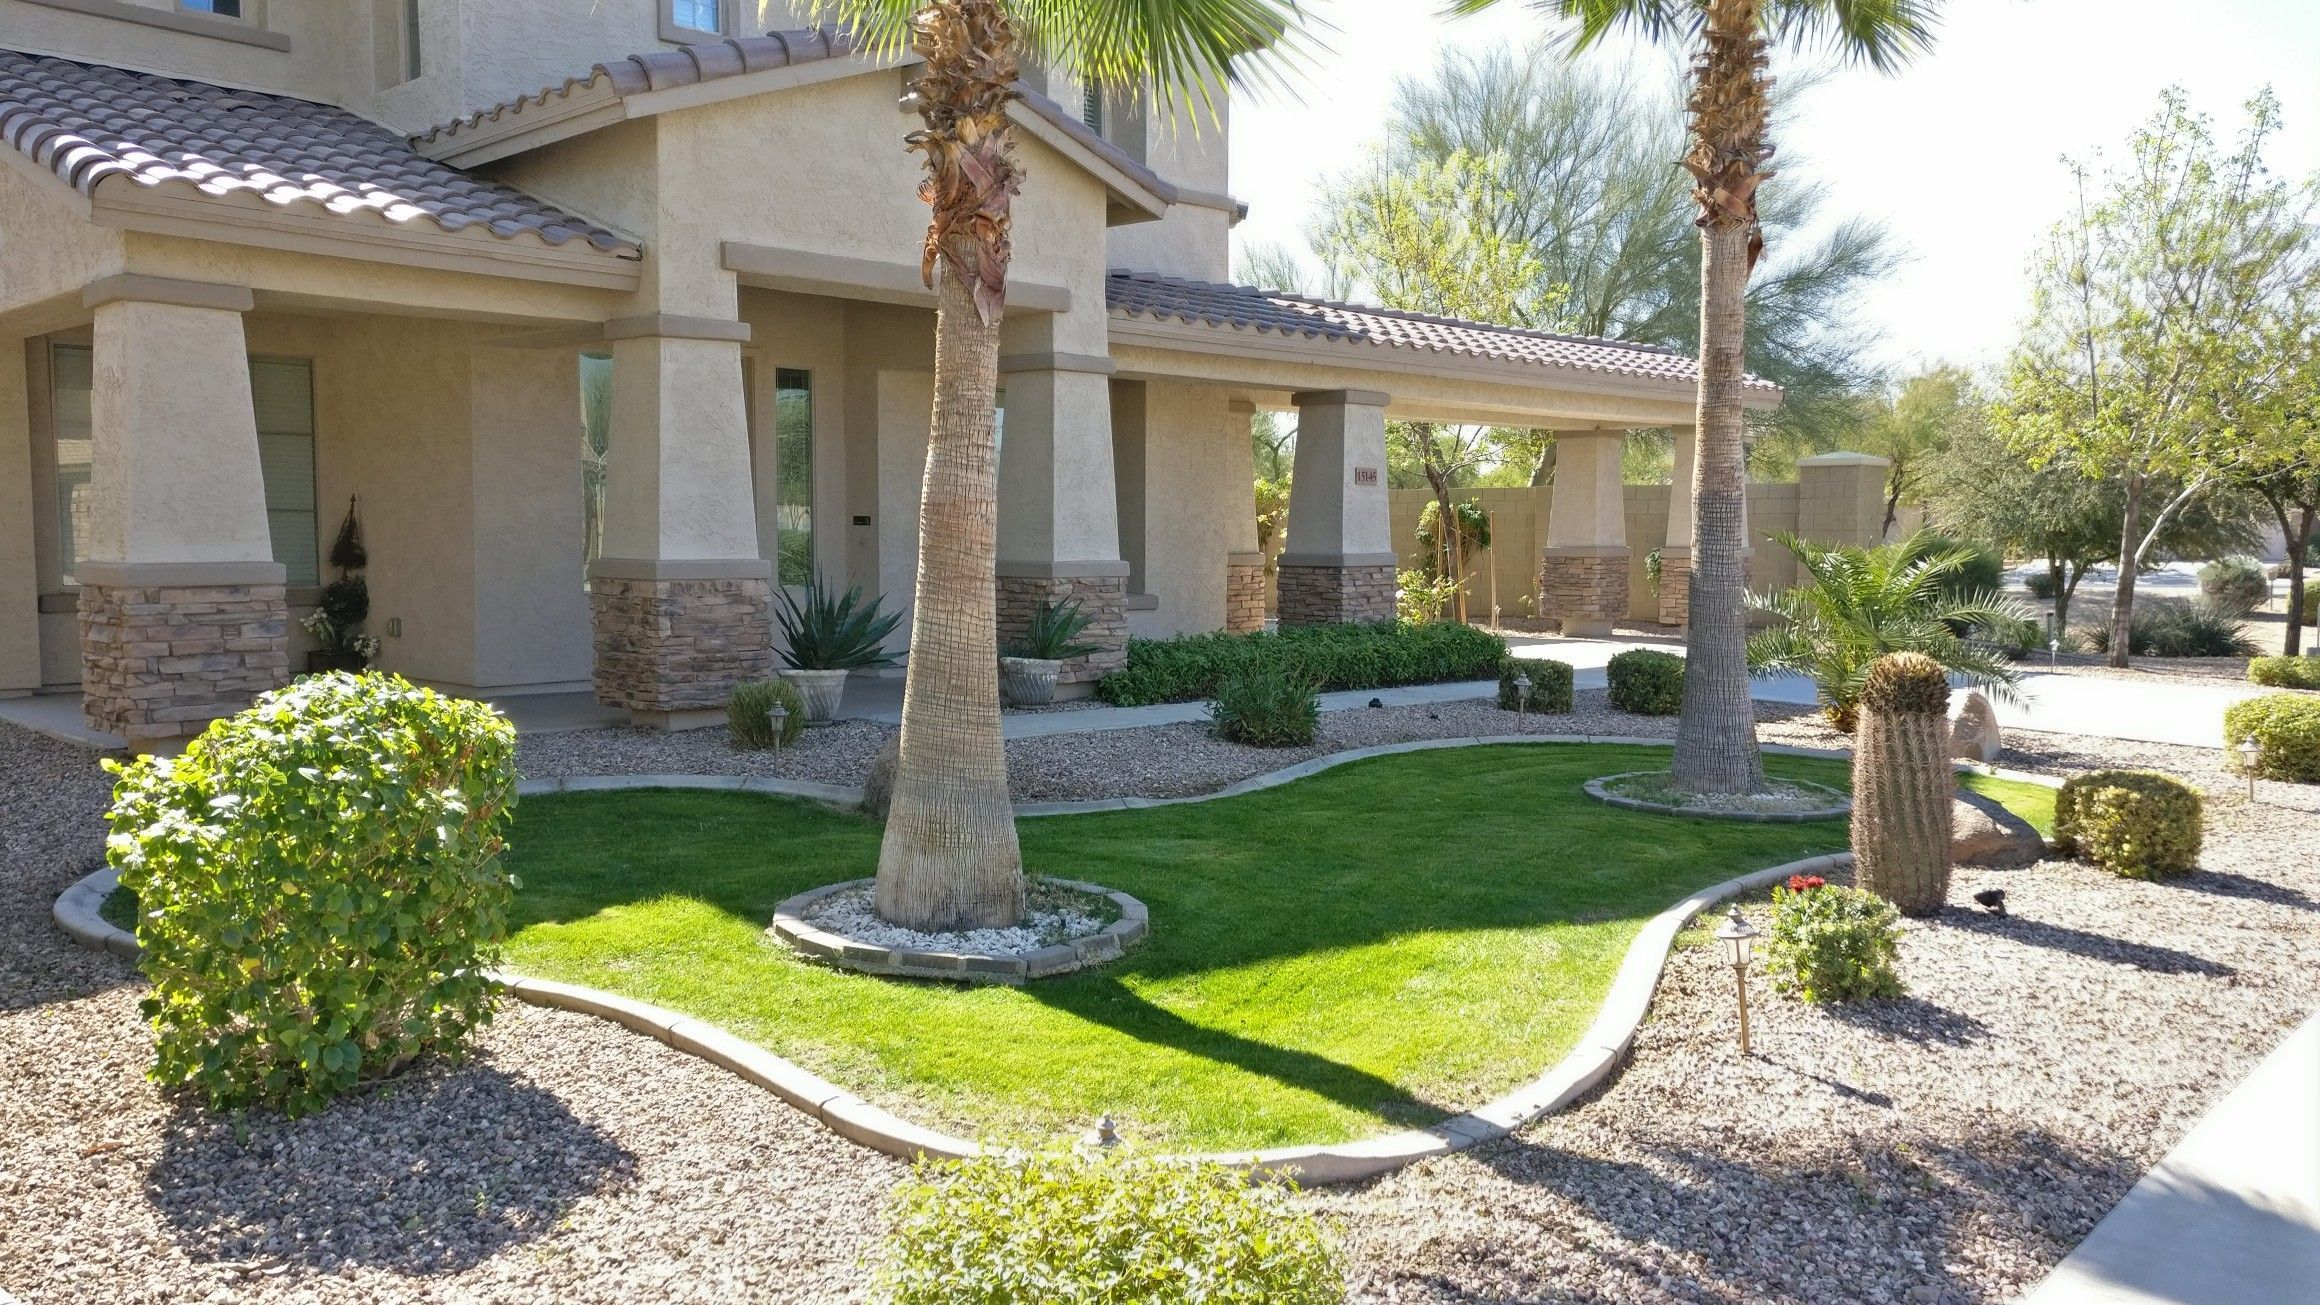 Agua Fria Landscaping Arizona Landscaping Landscaping Services Arizona Desert Landscaping